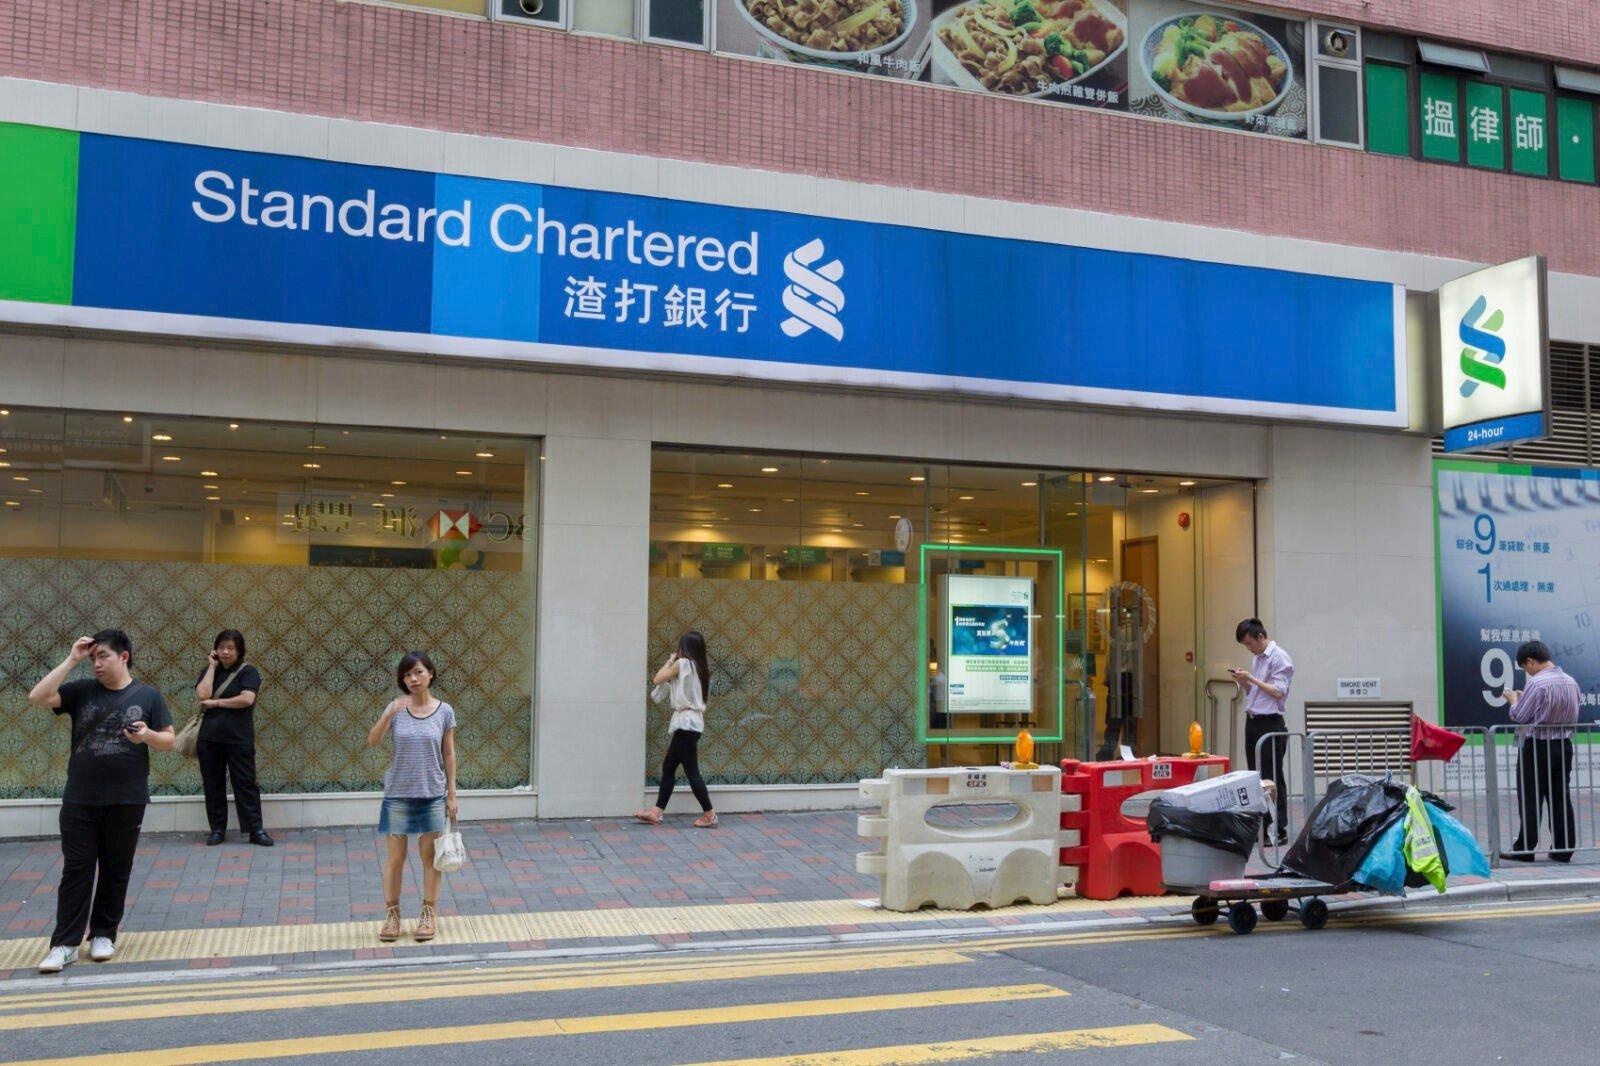 Stard Chartered in Hong Kong